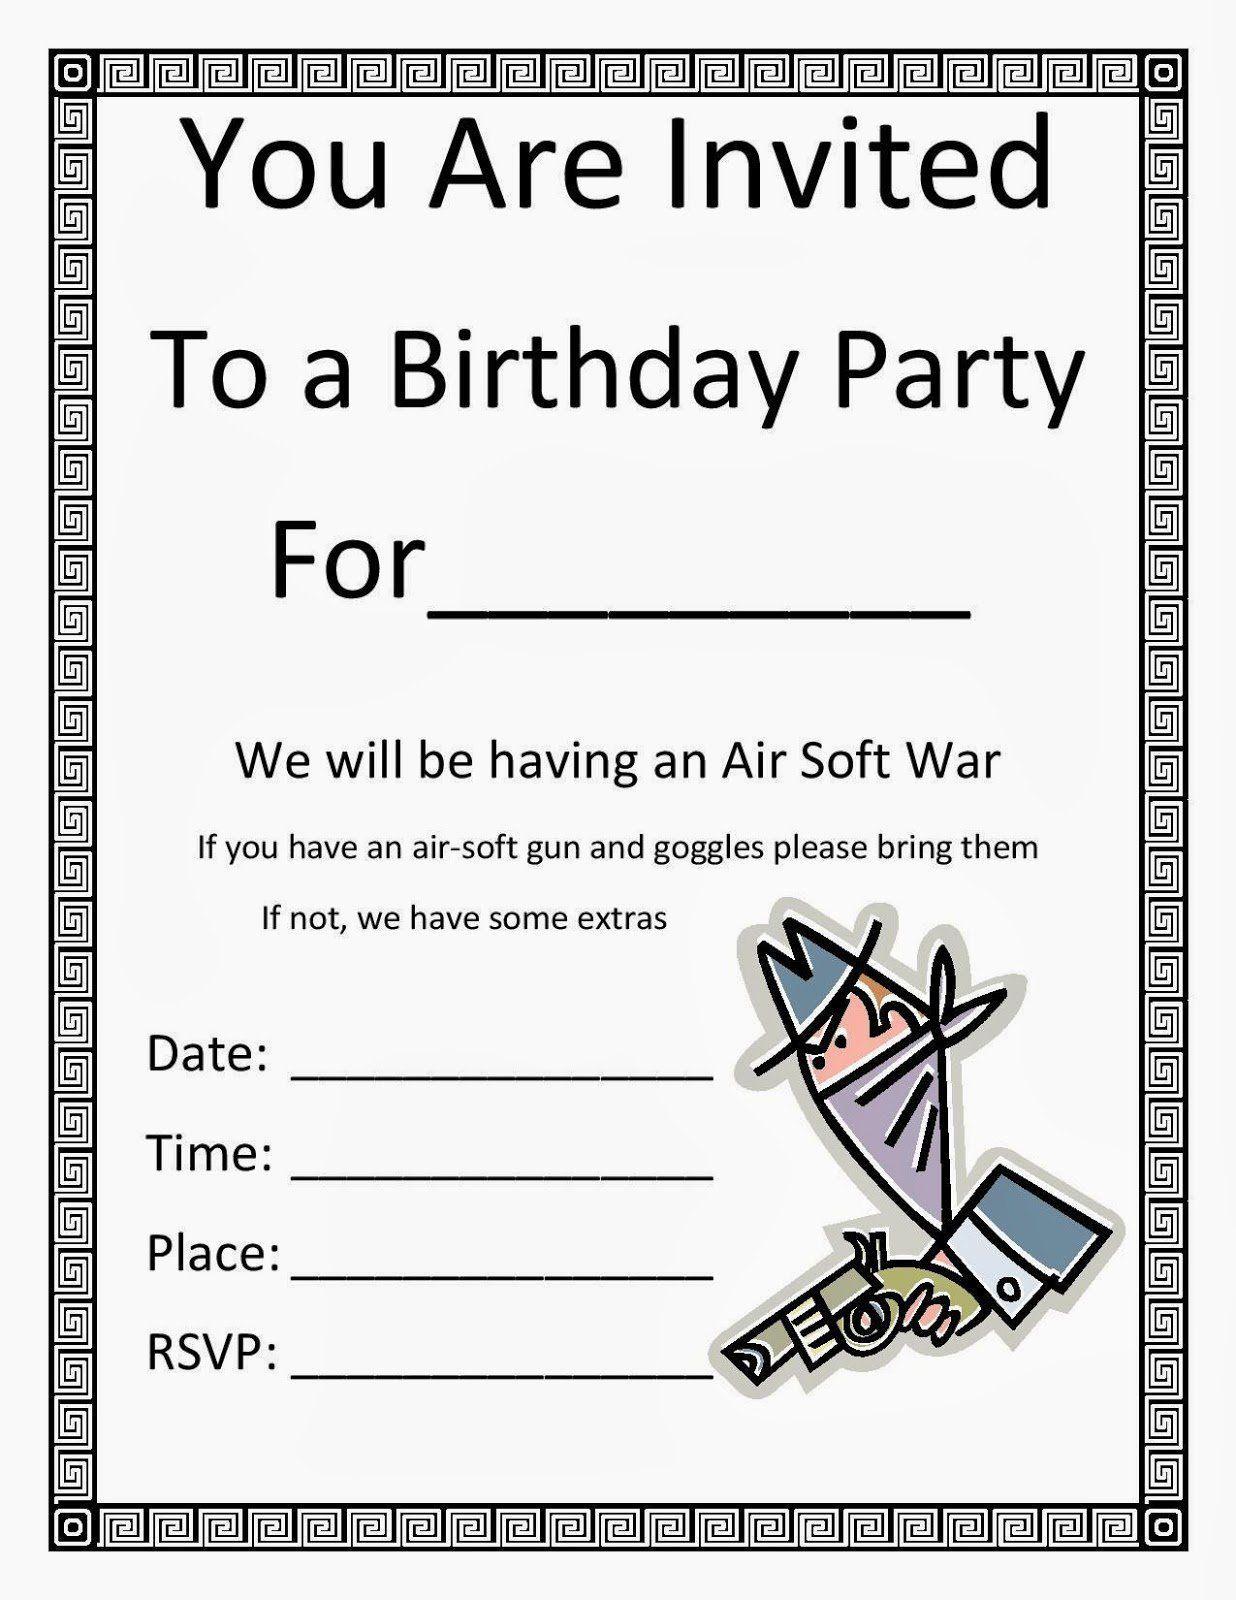 001 Fascinating Birthday Party Invitation Template Word High Resolution  40th Wording Sample Unicorn FreeFull